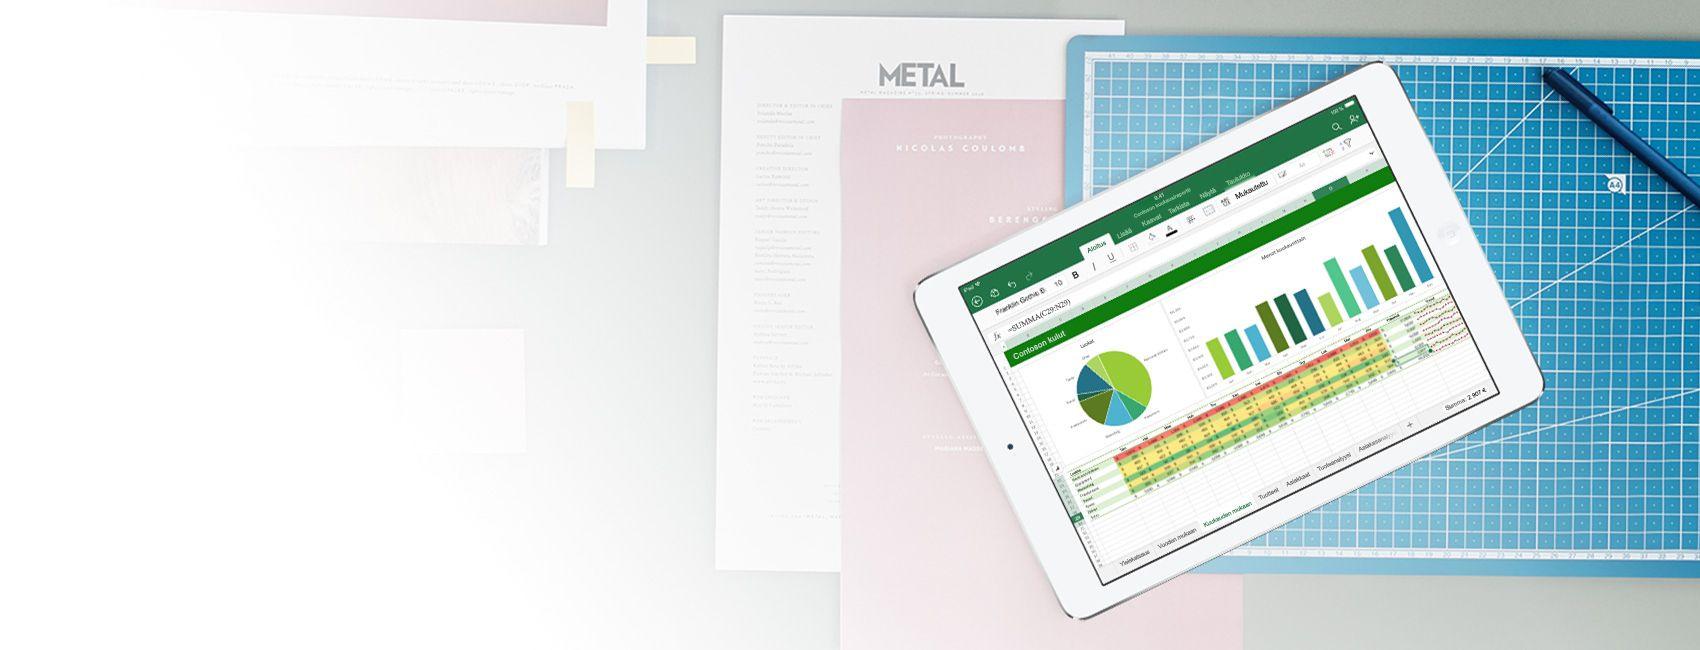 iPad, jossa näkyy Excel-laskentataulukko ja -kaavio iOS:n Excel-sovelluksessa